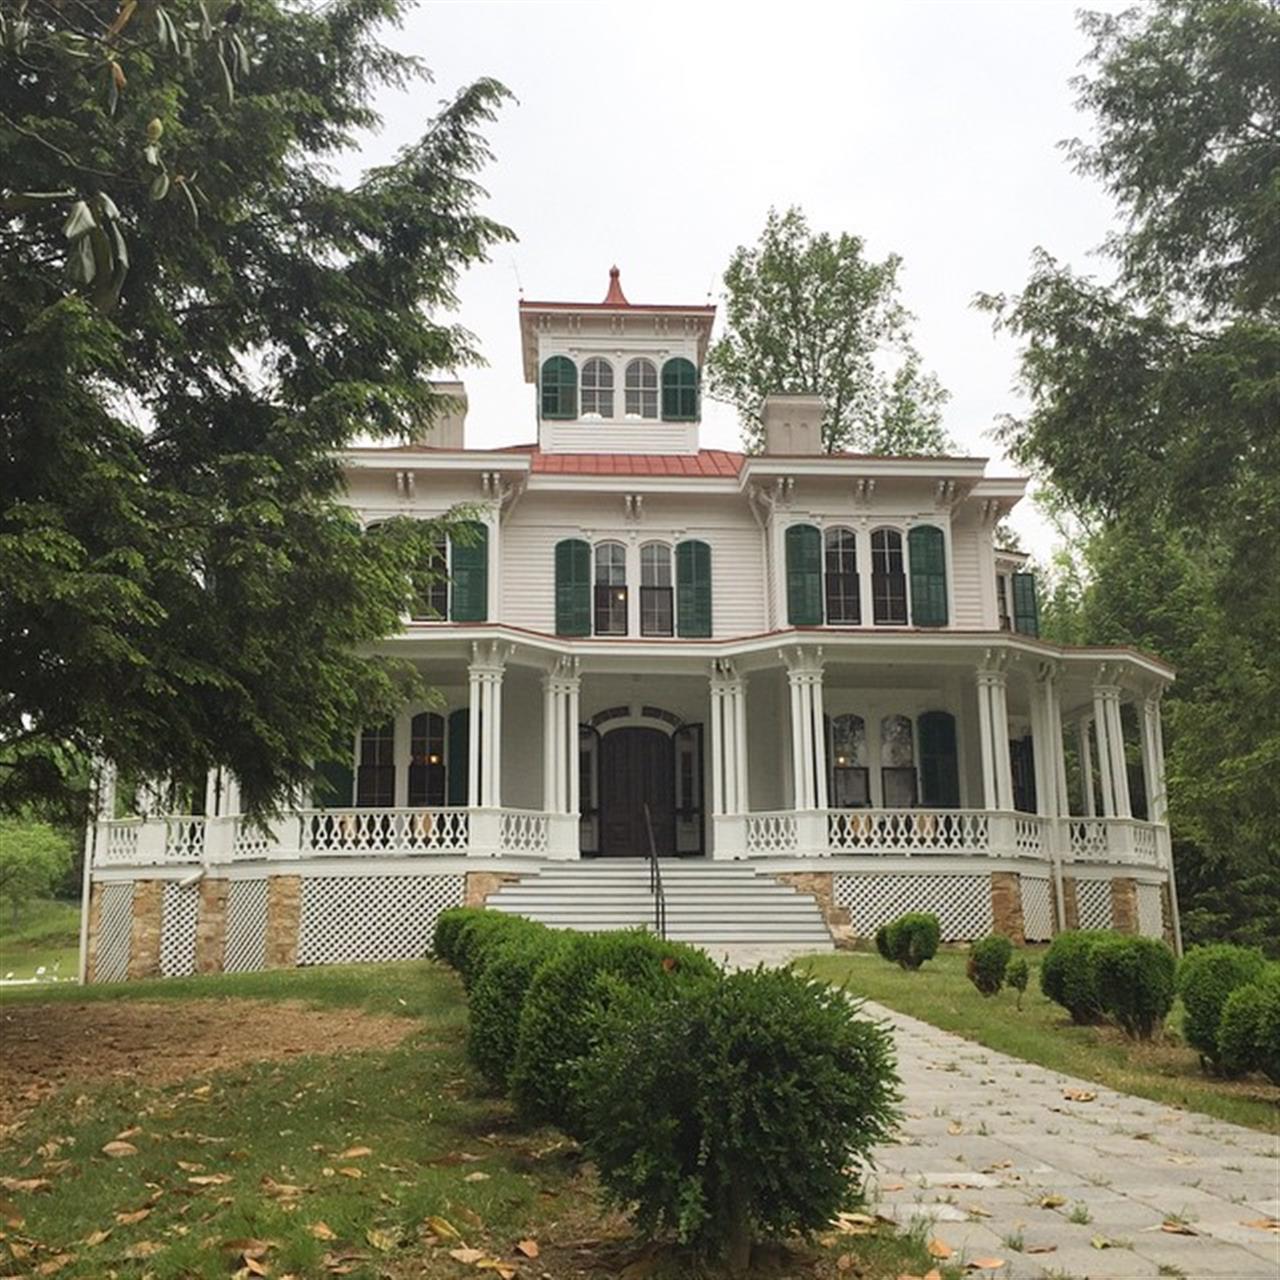 The Hardman Farm residence at the Historic Hardman Farm State Park in Helen GA